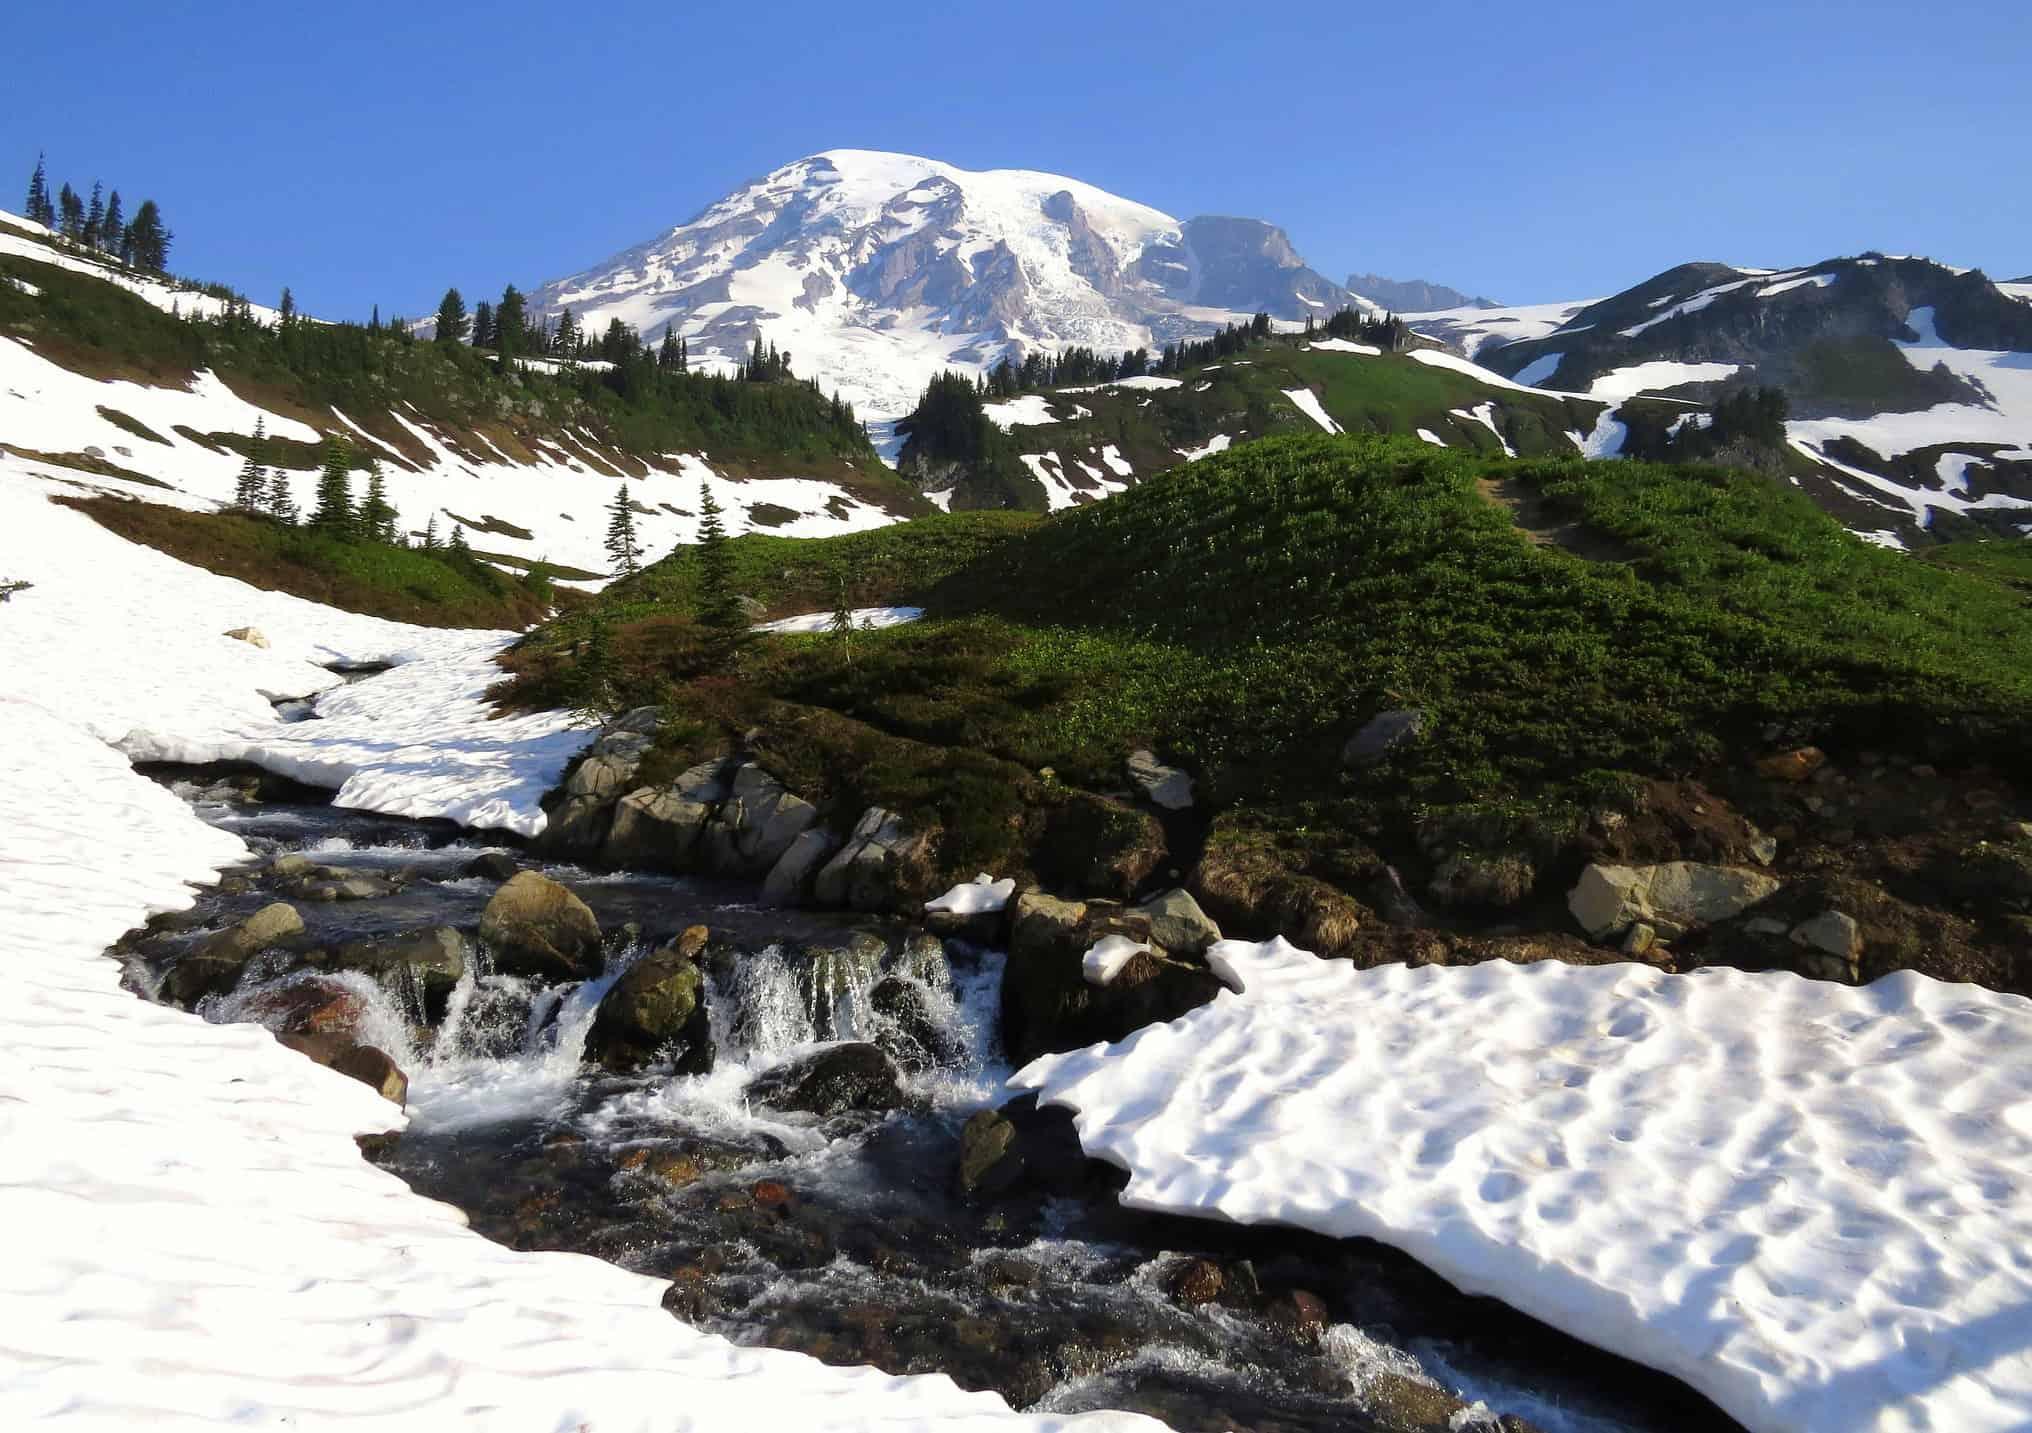 Waterfalls at Mt Rainier